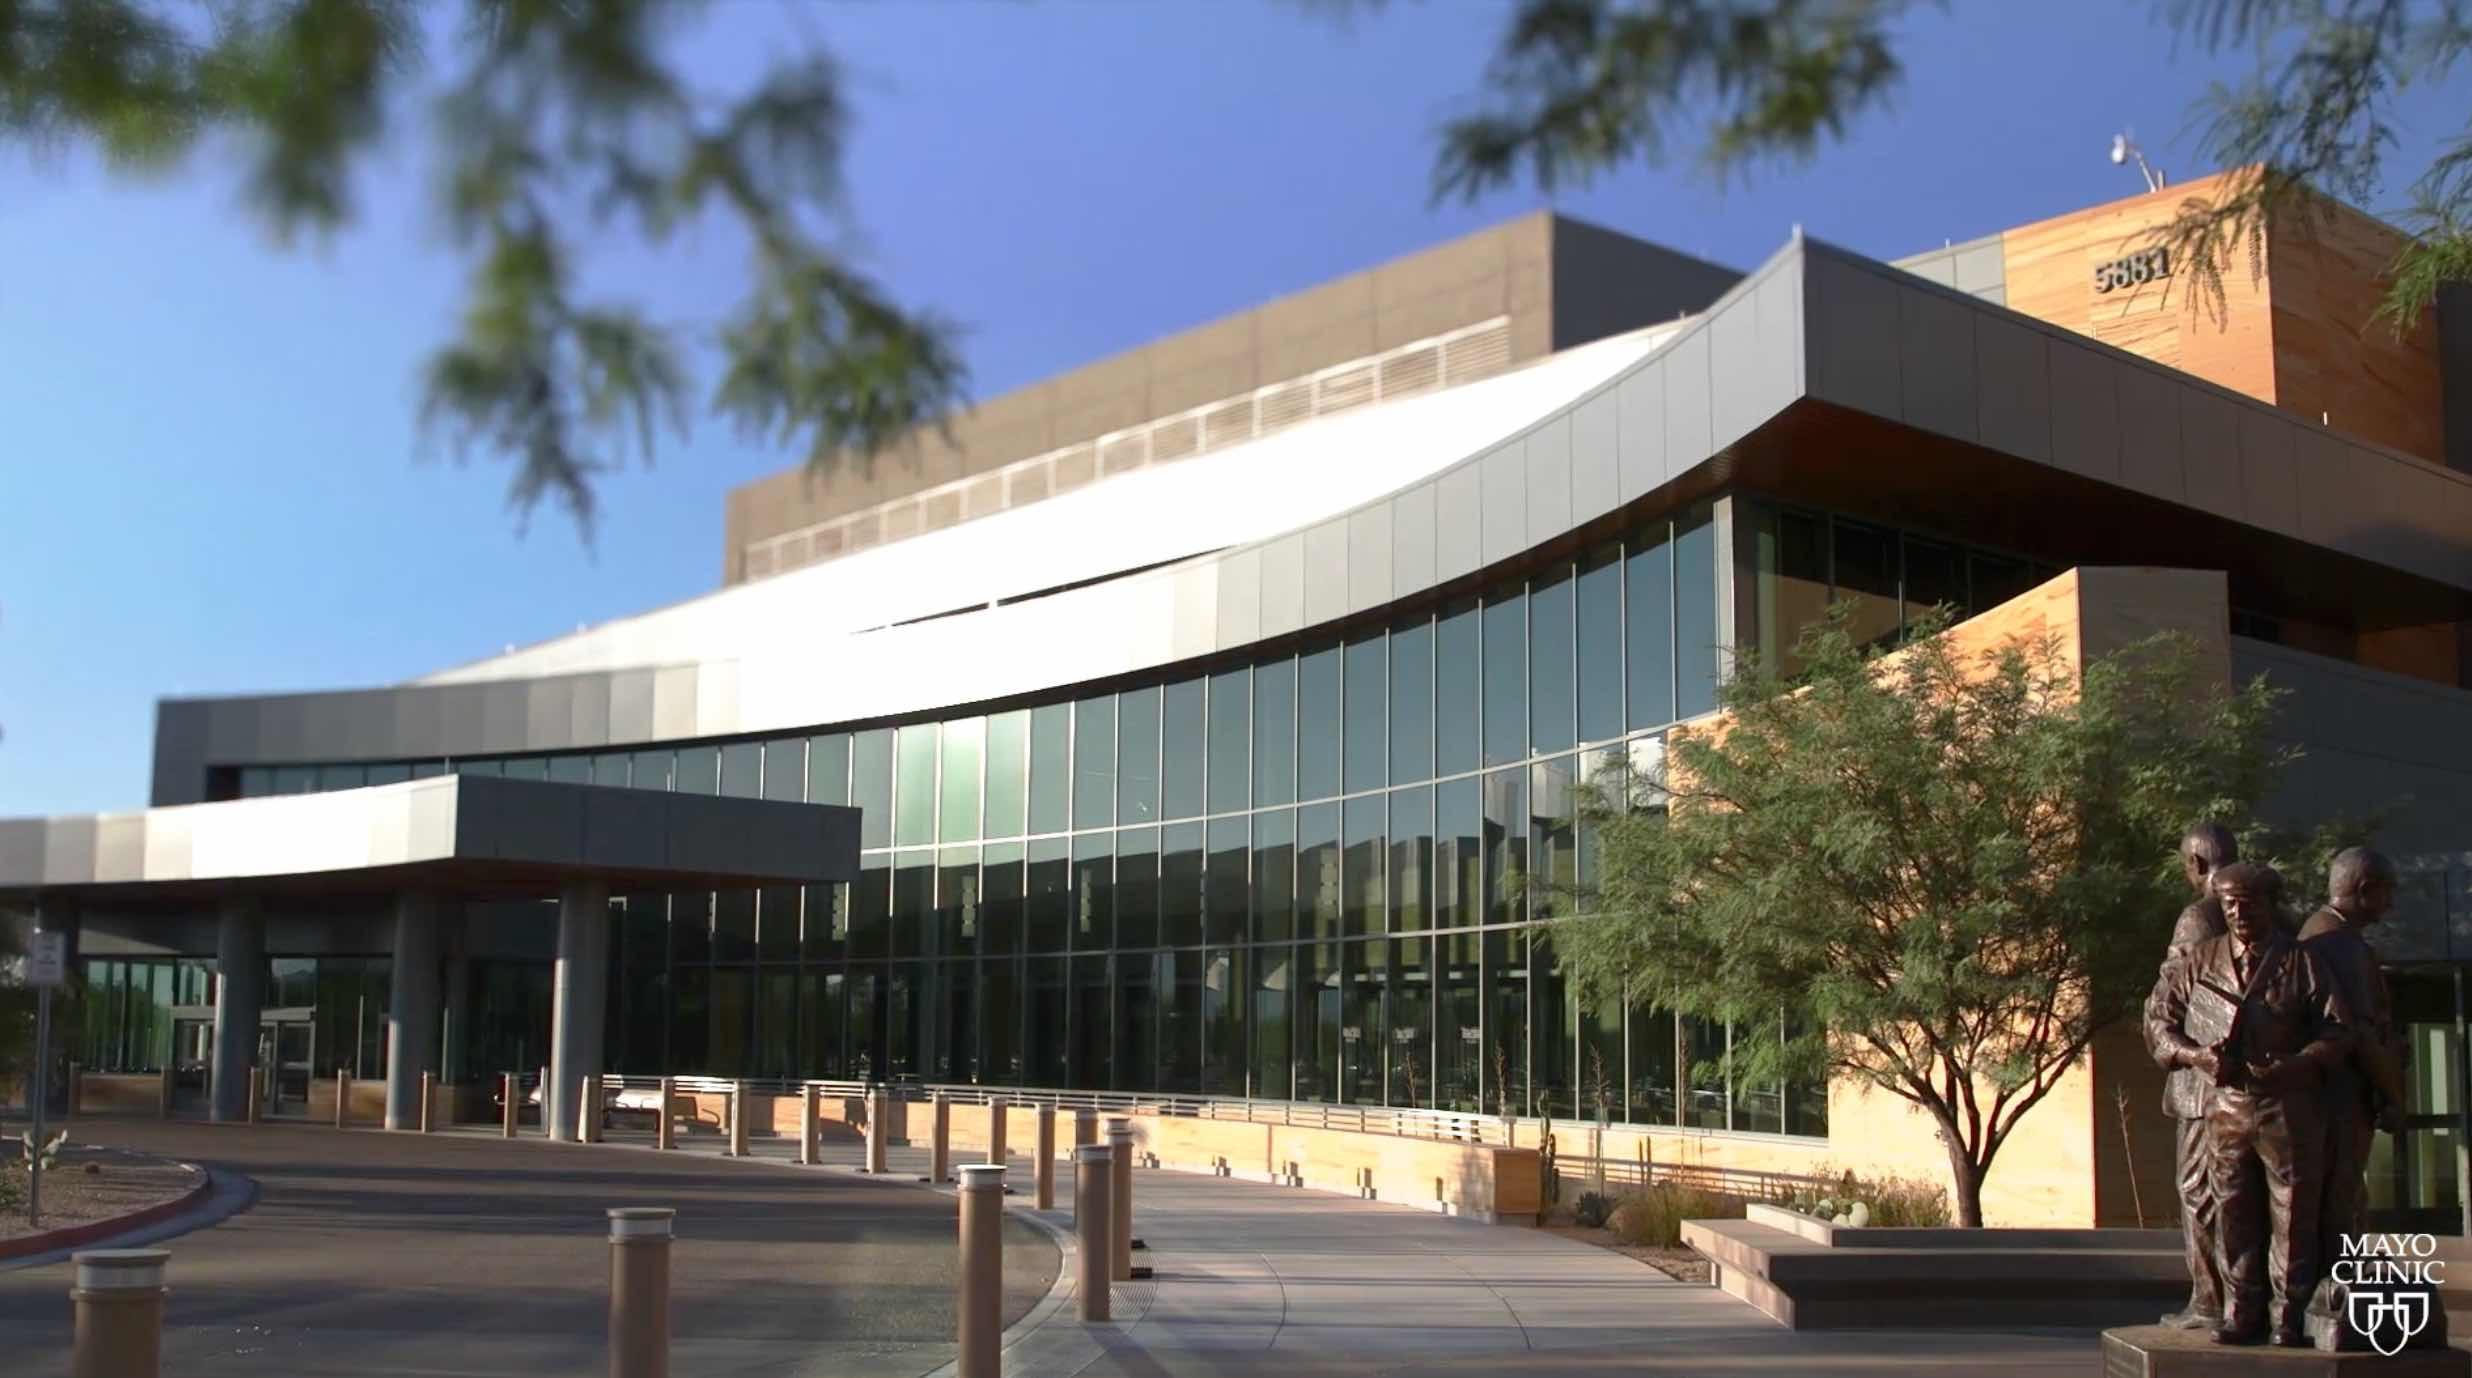 Cancer care at Mayo Clinic's campus in Arizona - Mayo Clinic